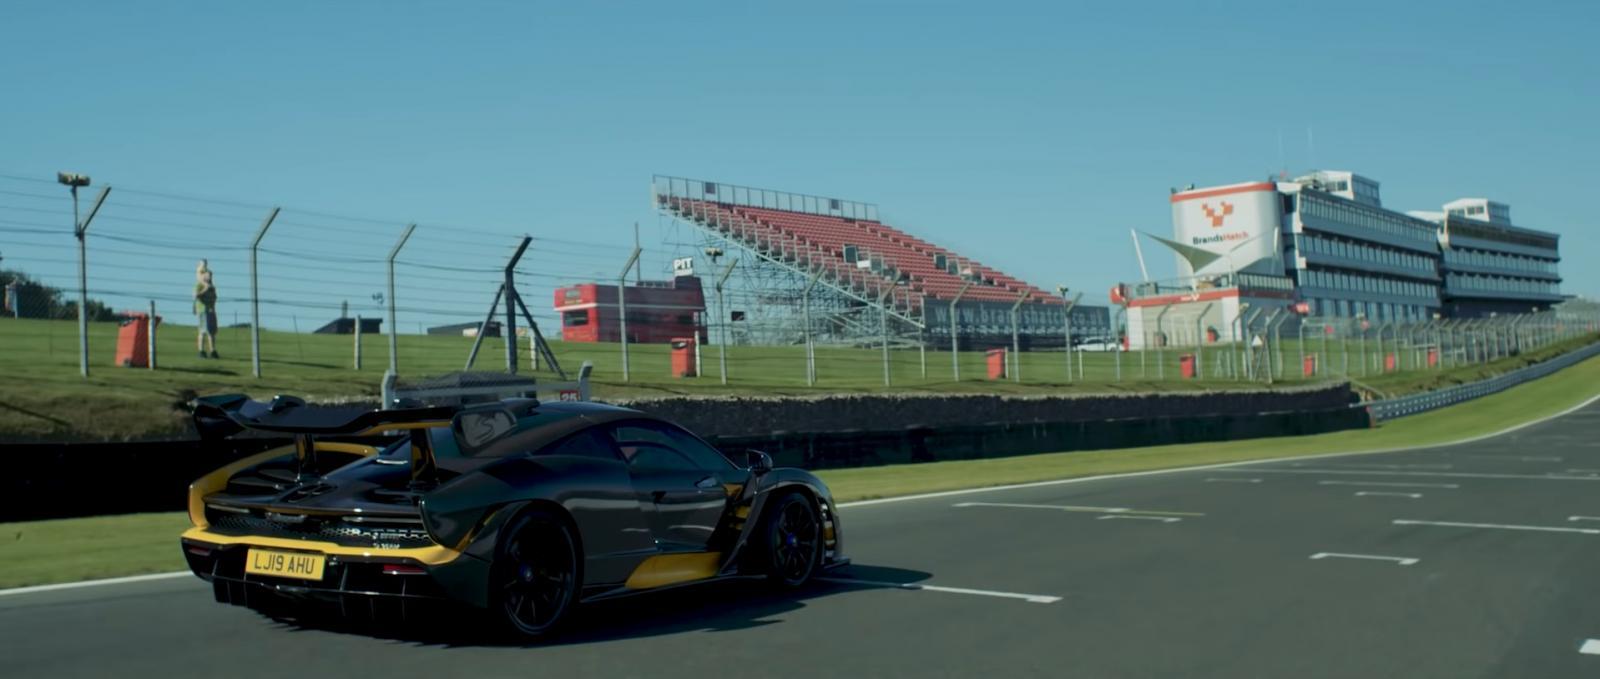 McLaren Senna de Gordon Ramsay